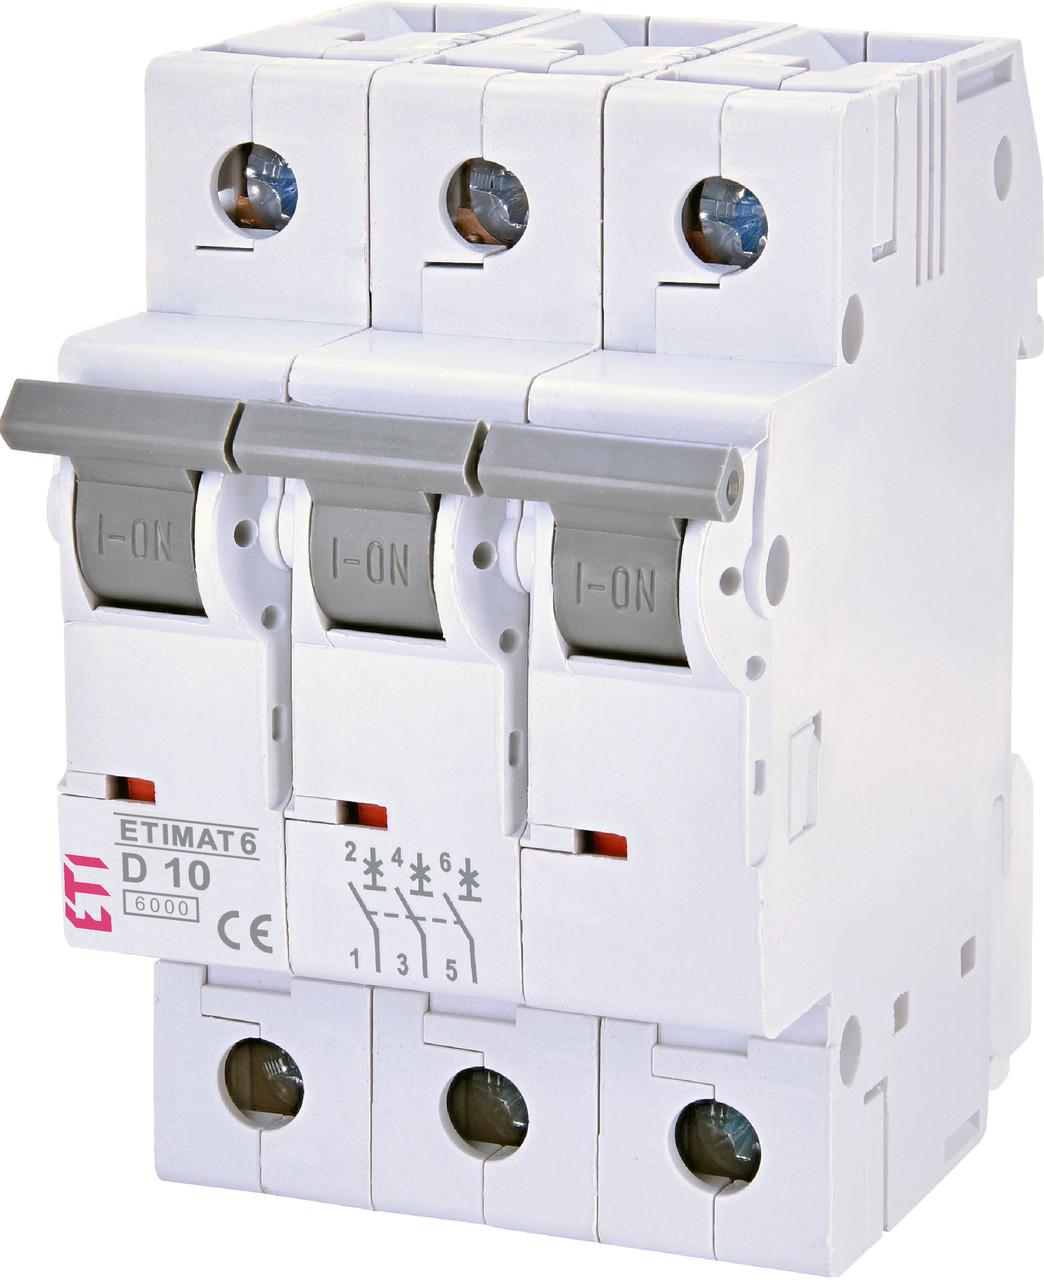 Авт. вимикач ETI ETIMAT 6 3p 10A D 6kA 2164514